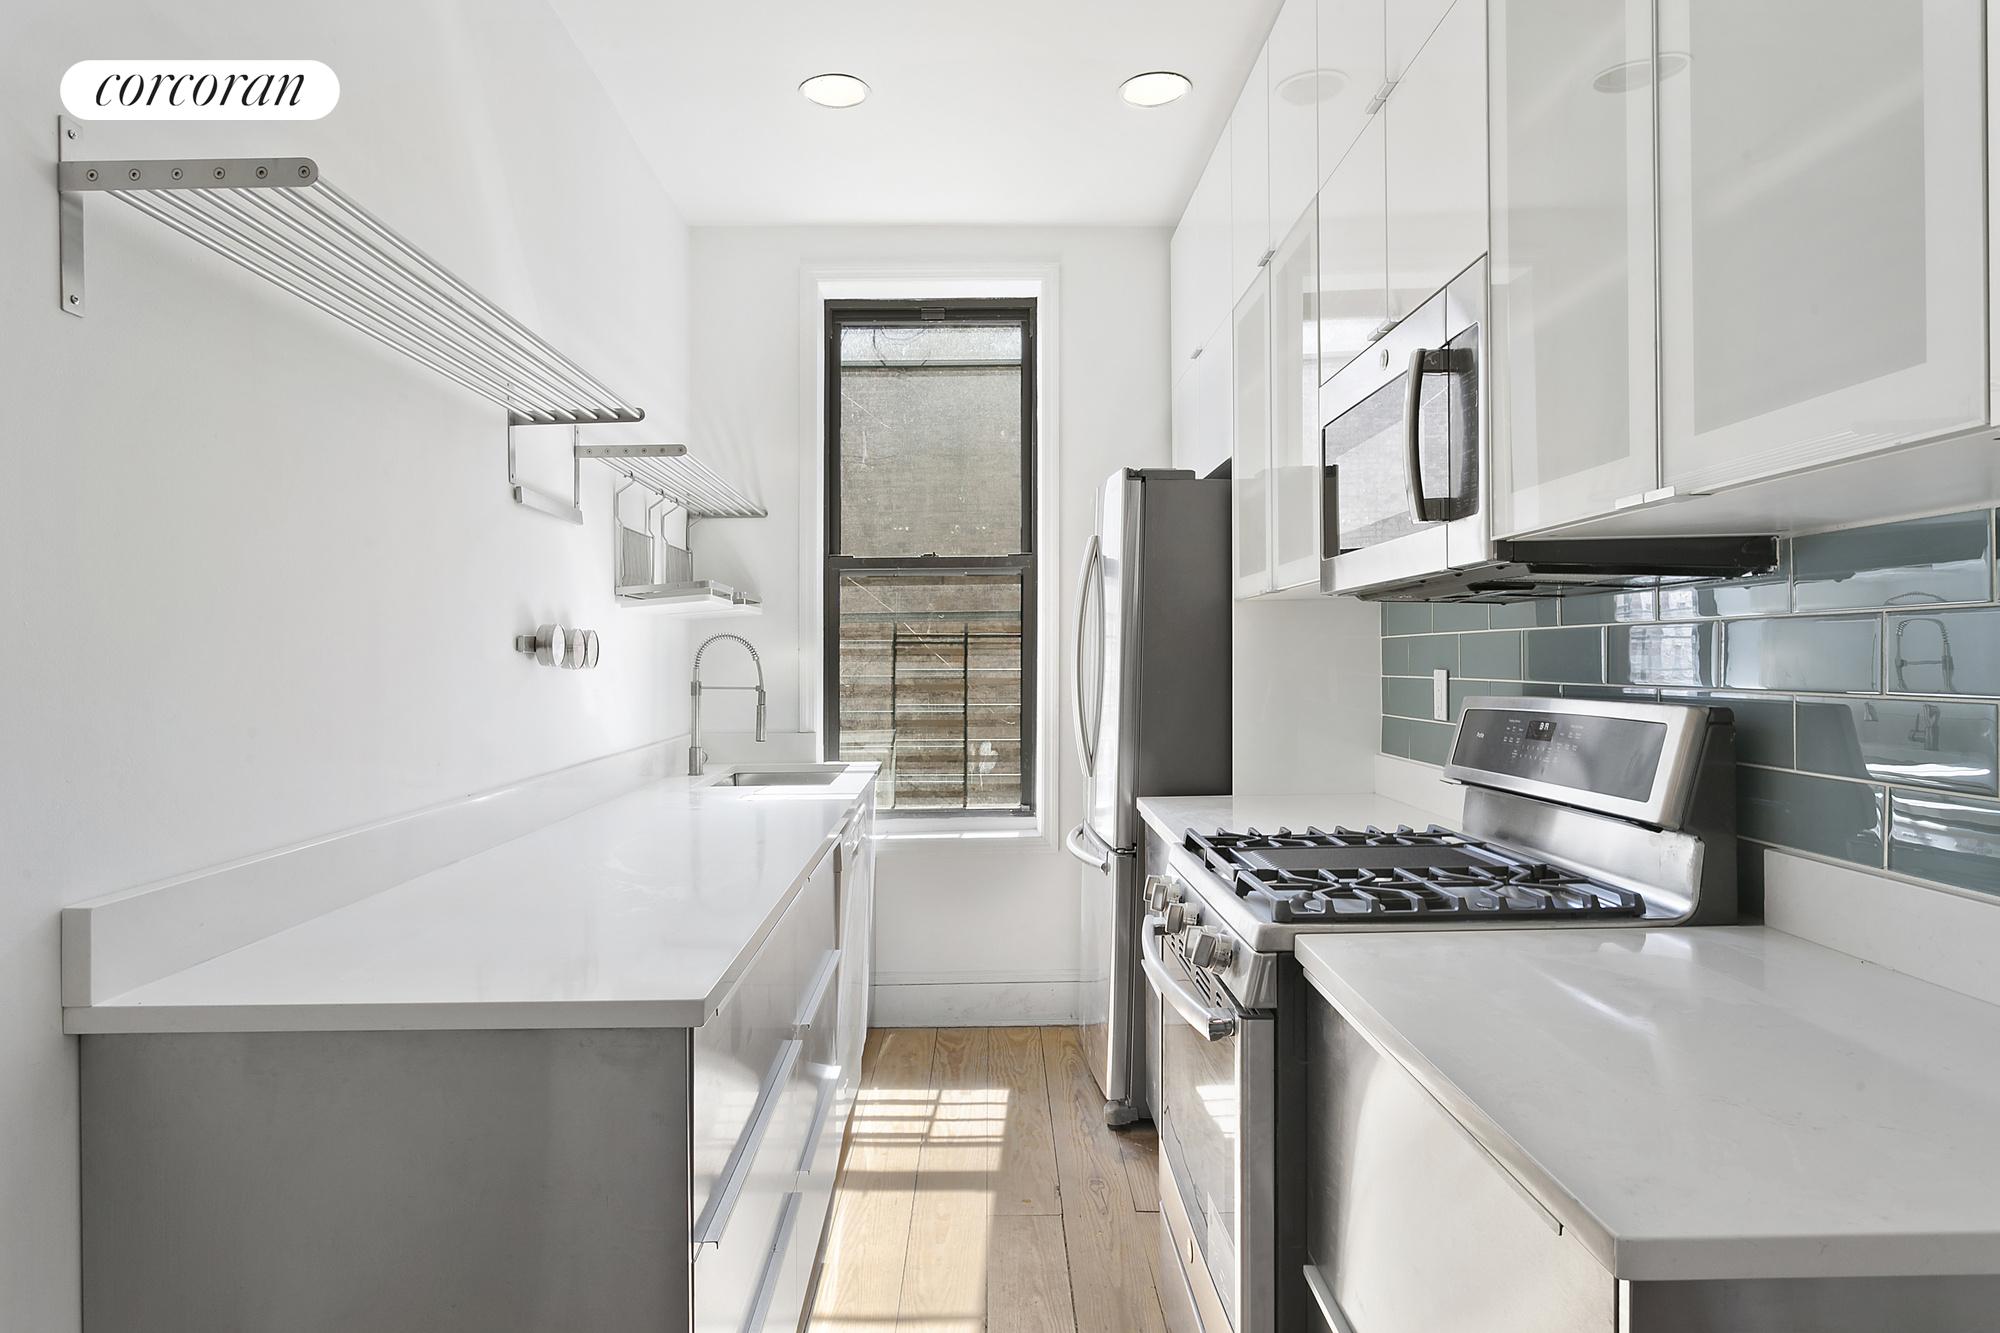 Corcoran, 1019 8th Avenue, Apt. 2, Park Slope Real Estate, Brooklyn ...